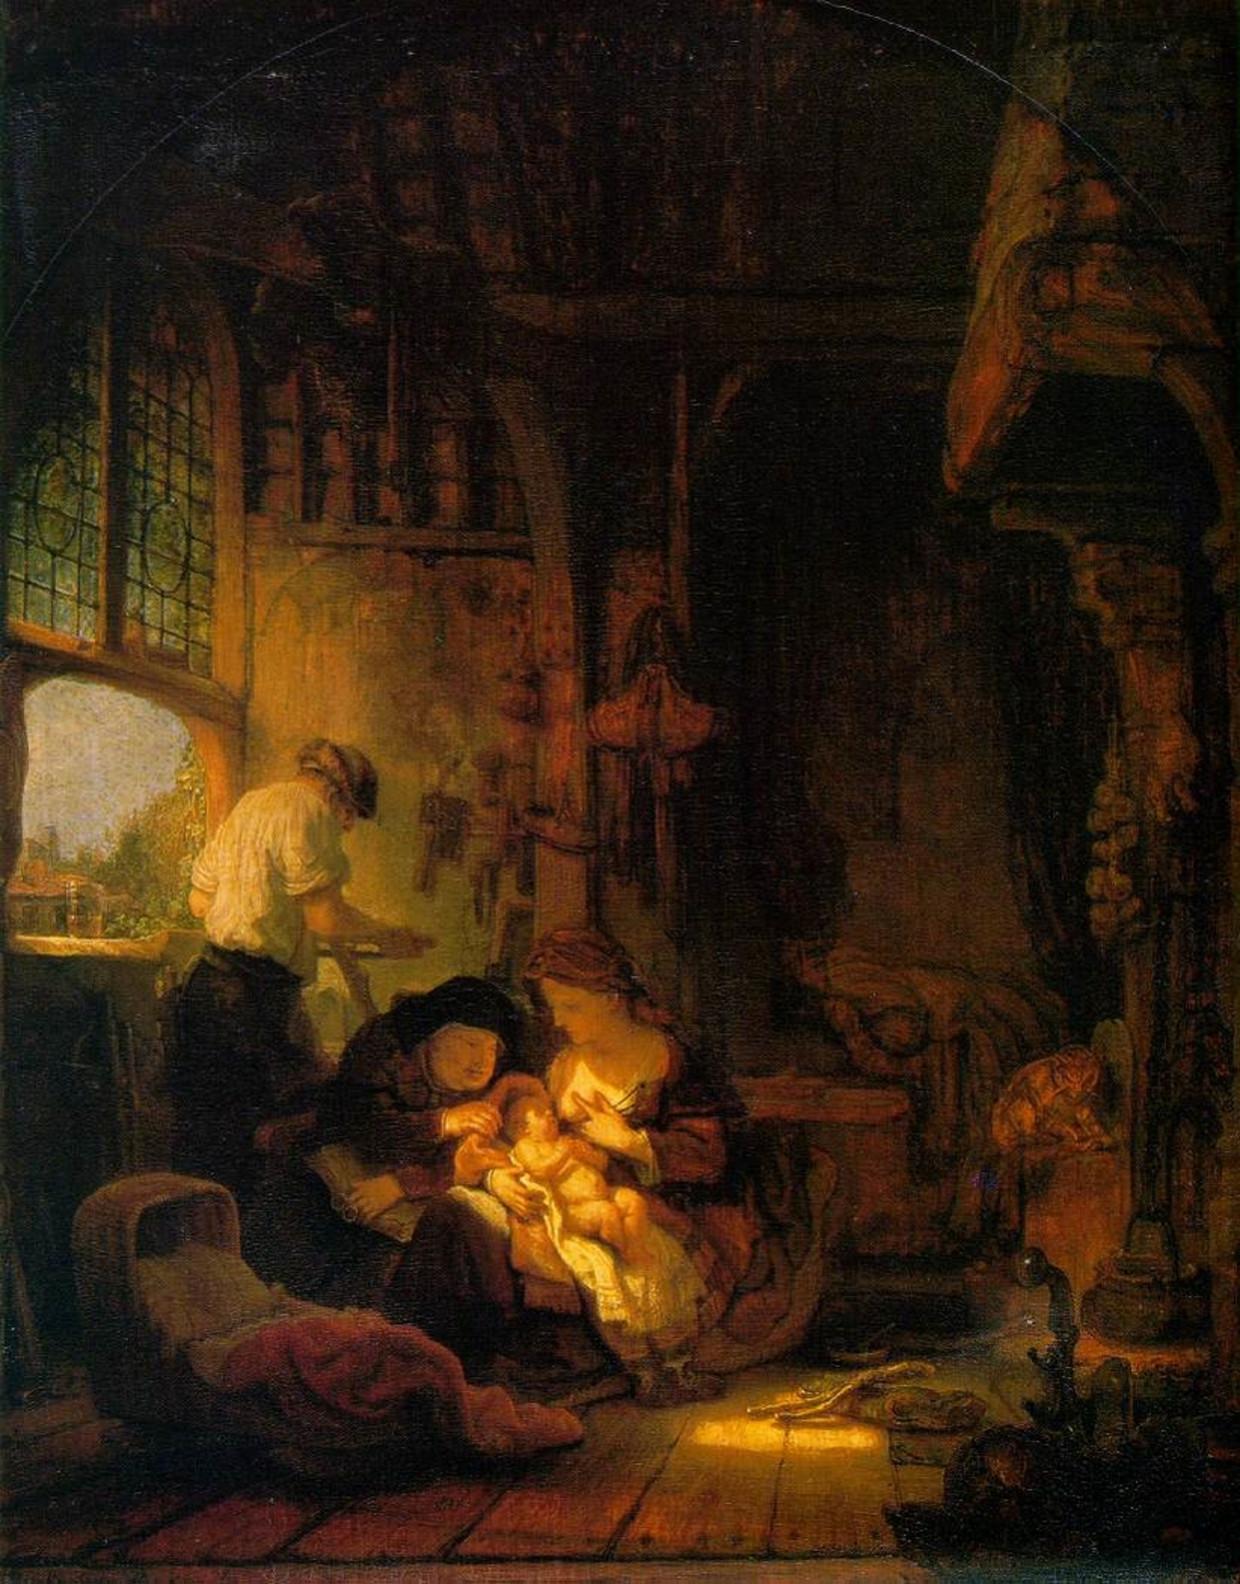 Rembrandt, De heilige familie met Anna (ca. 1640) in Musée du Louvre, Parijs.